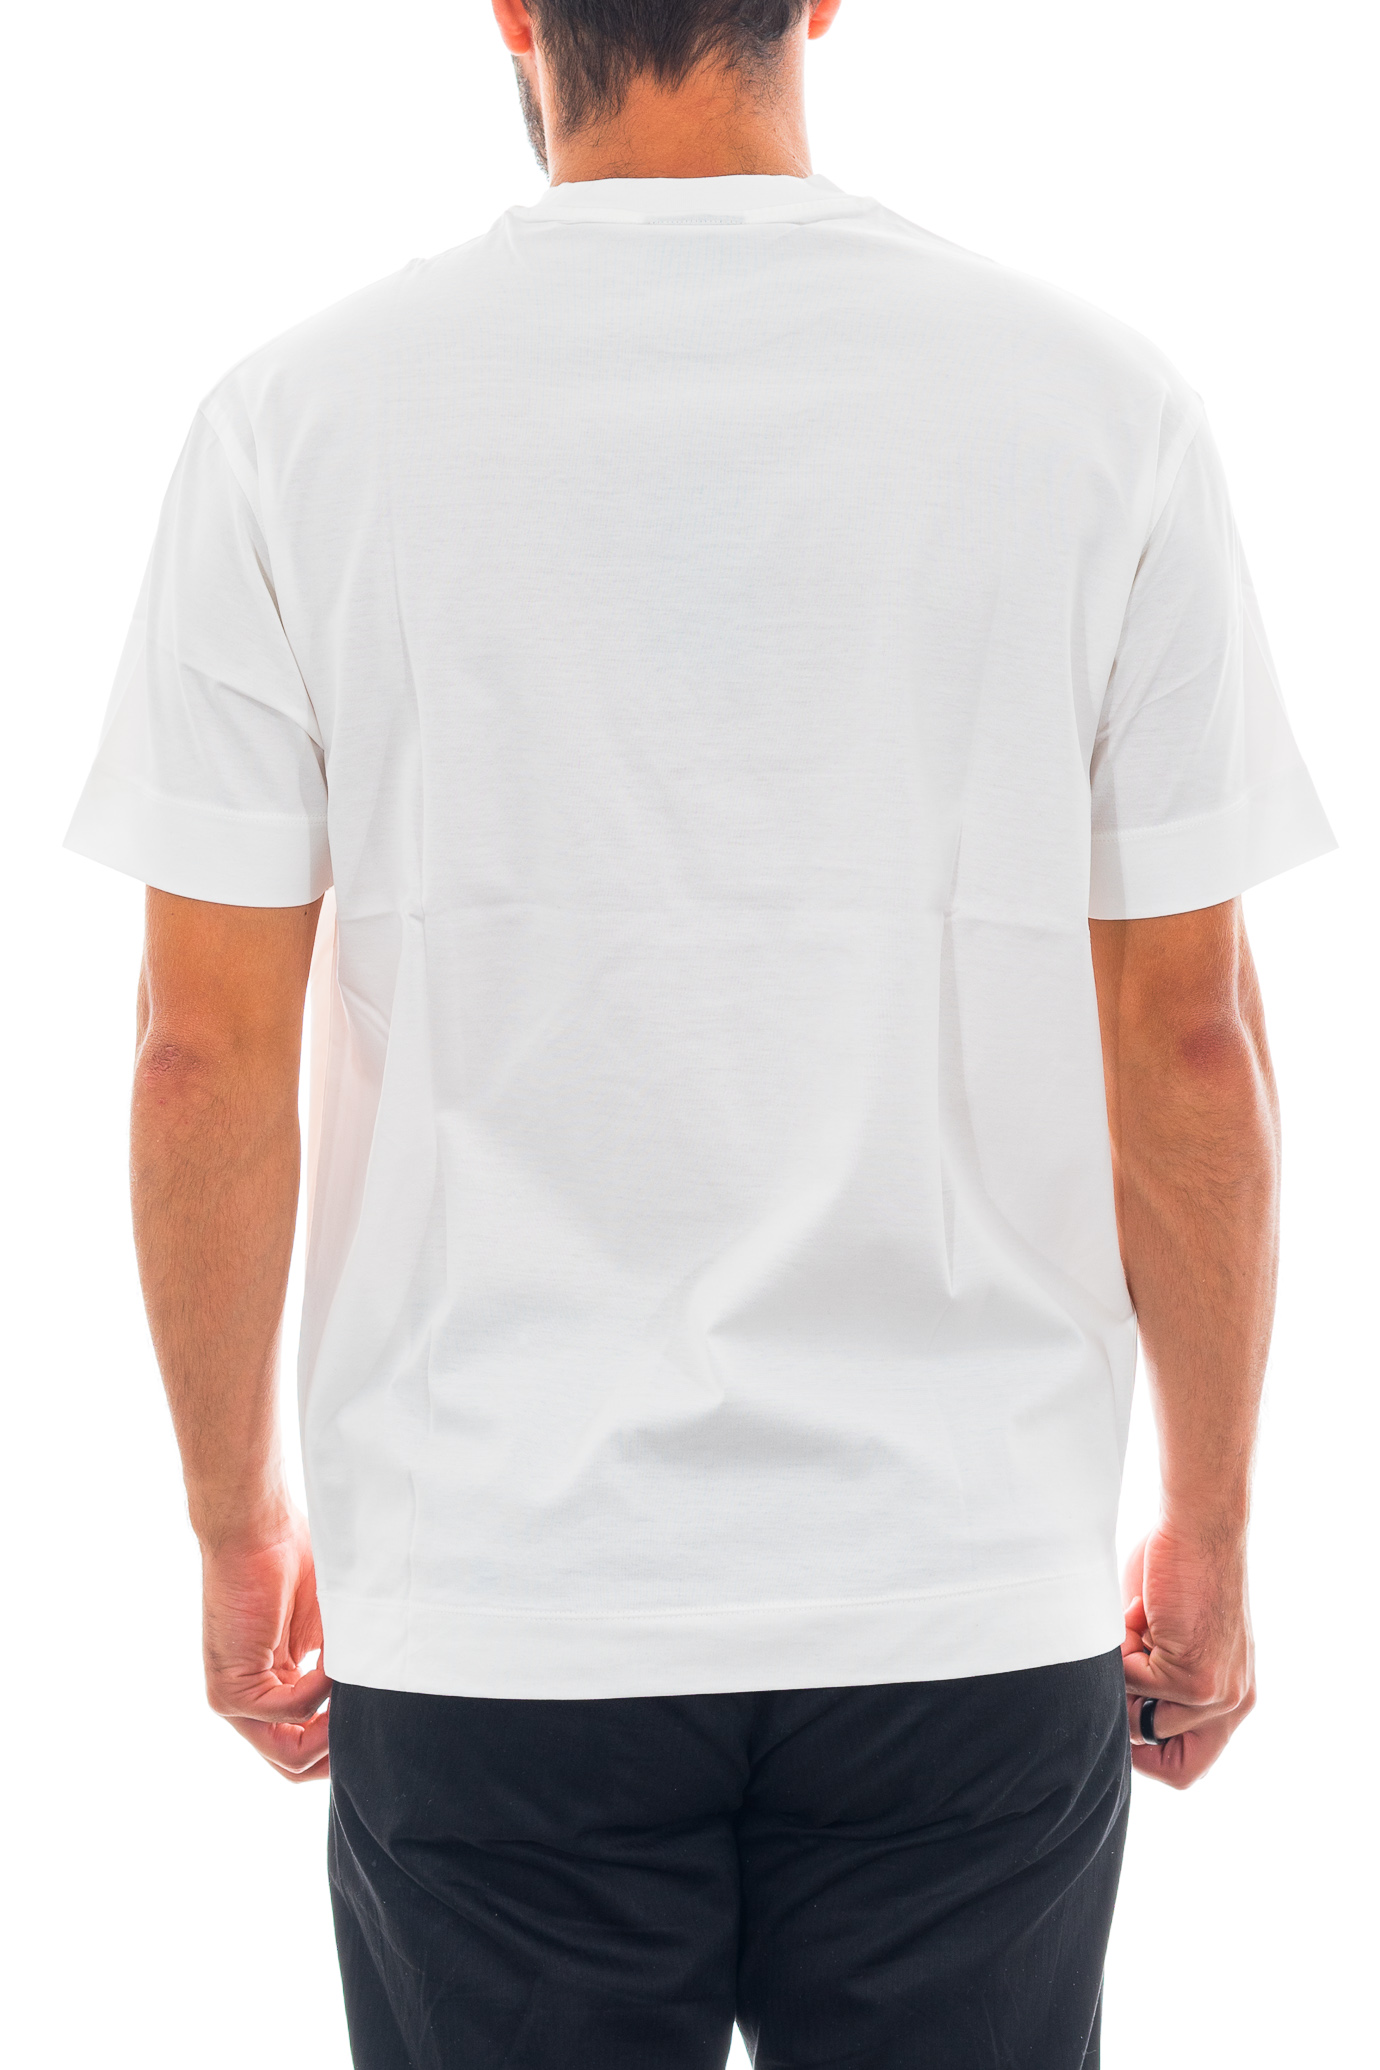 T-shirt EMPORIO ARMANI | T-shirt | 6H1TG5-1JTUZ0146